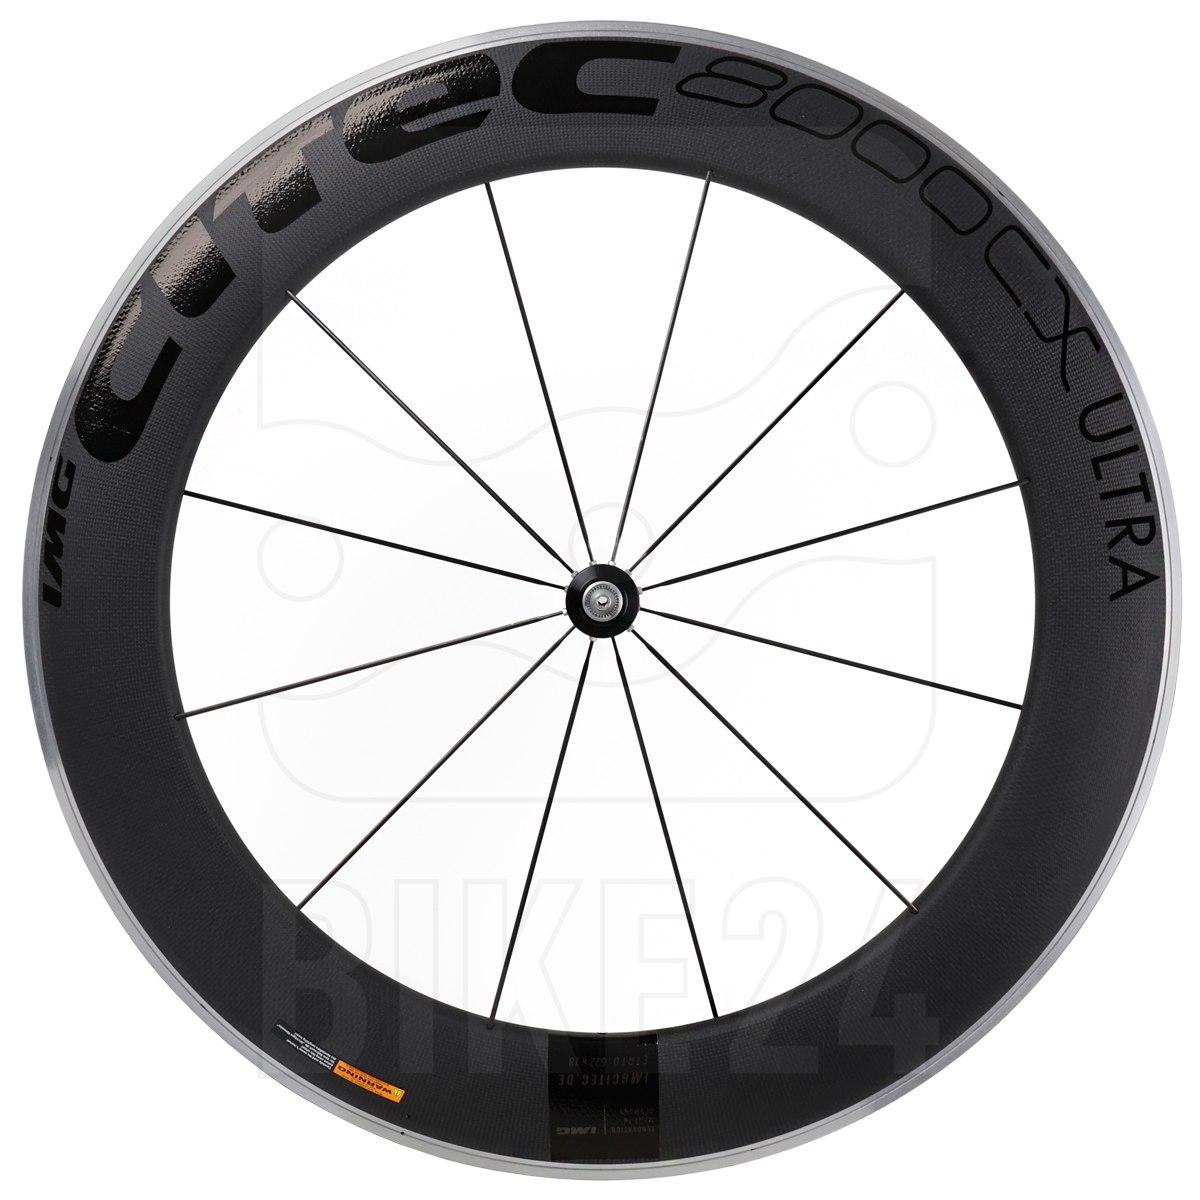 CITEC 8000 CX / 80 Ultra Carbon 28 Inch Front Wheel - Clincher - 9x100mm QR - black